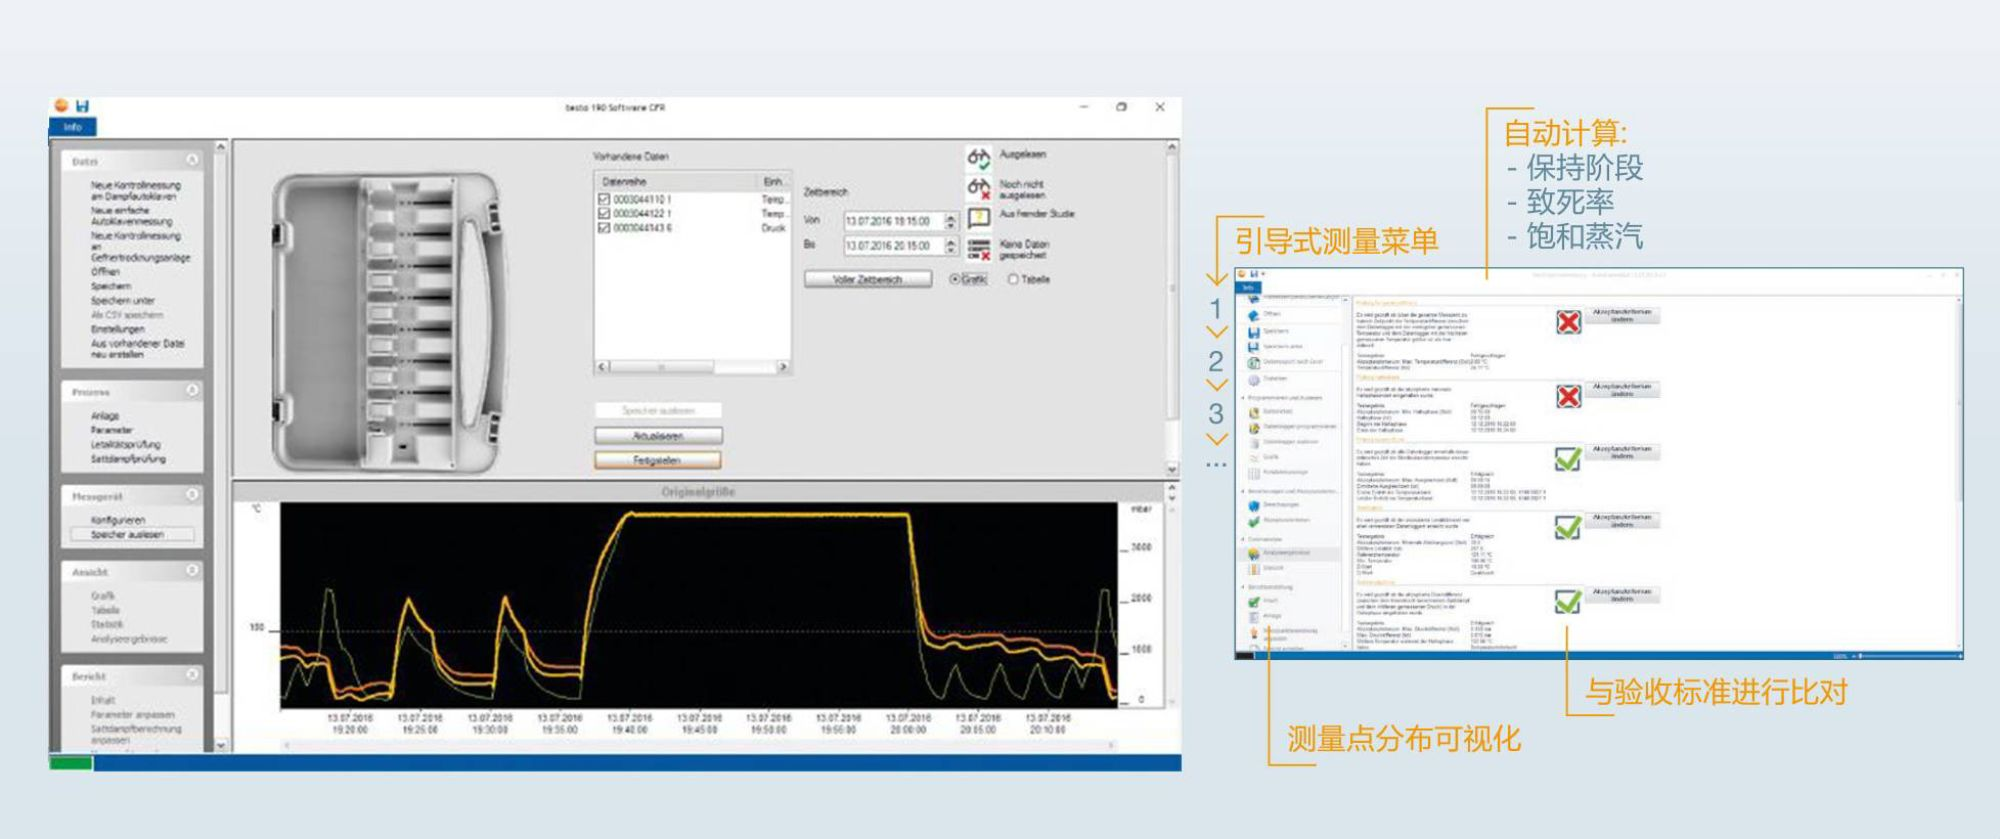 CN_20210813_Division_LifeScienc-P9-testo-190-software.jpg